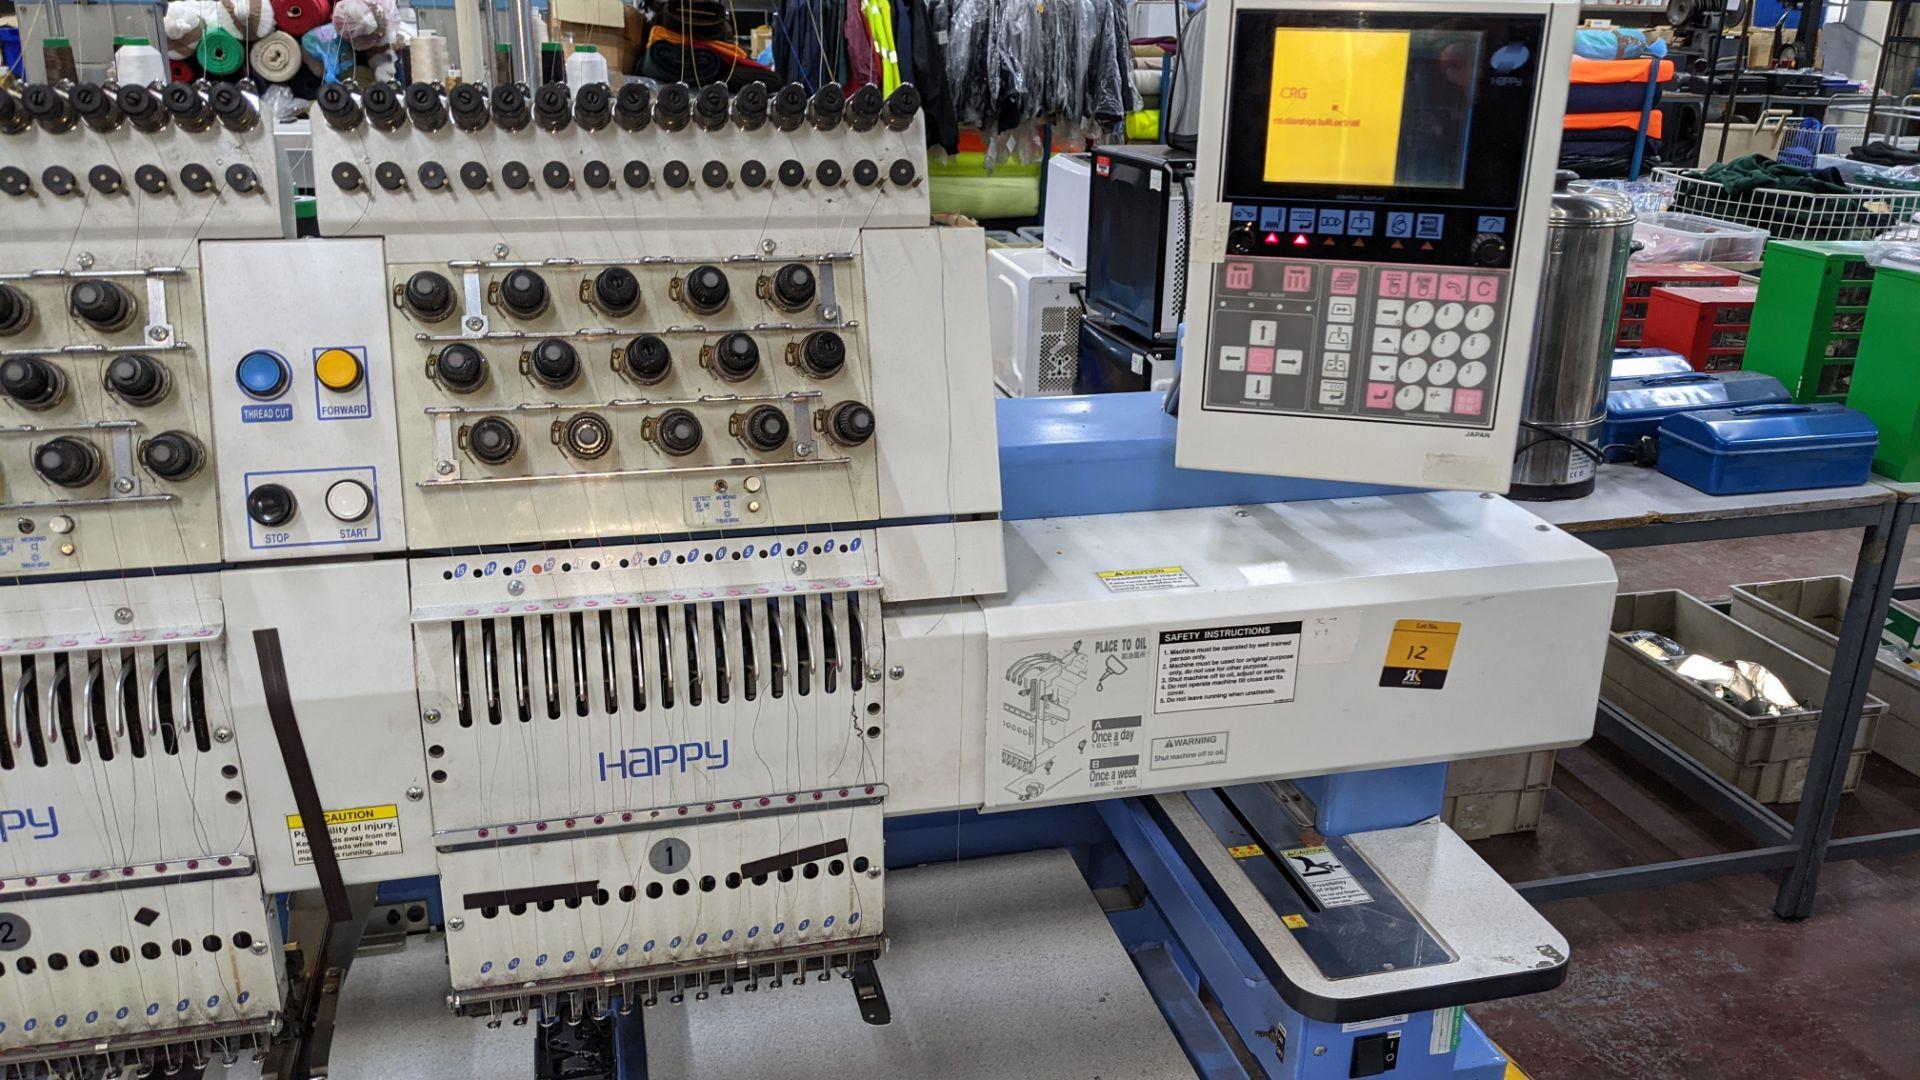 Happy 8 head embroidery machine, model HCG-1508B-45TTC, 15 needles per head, including frames & othe - Image 11 of 32